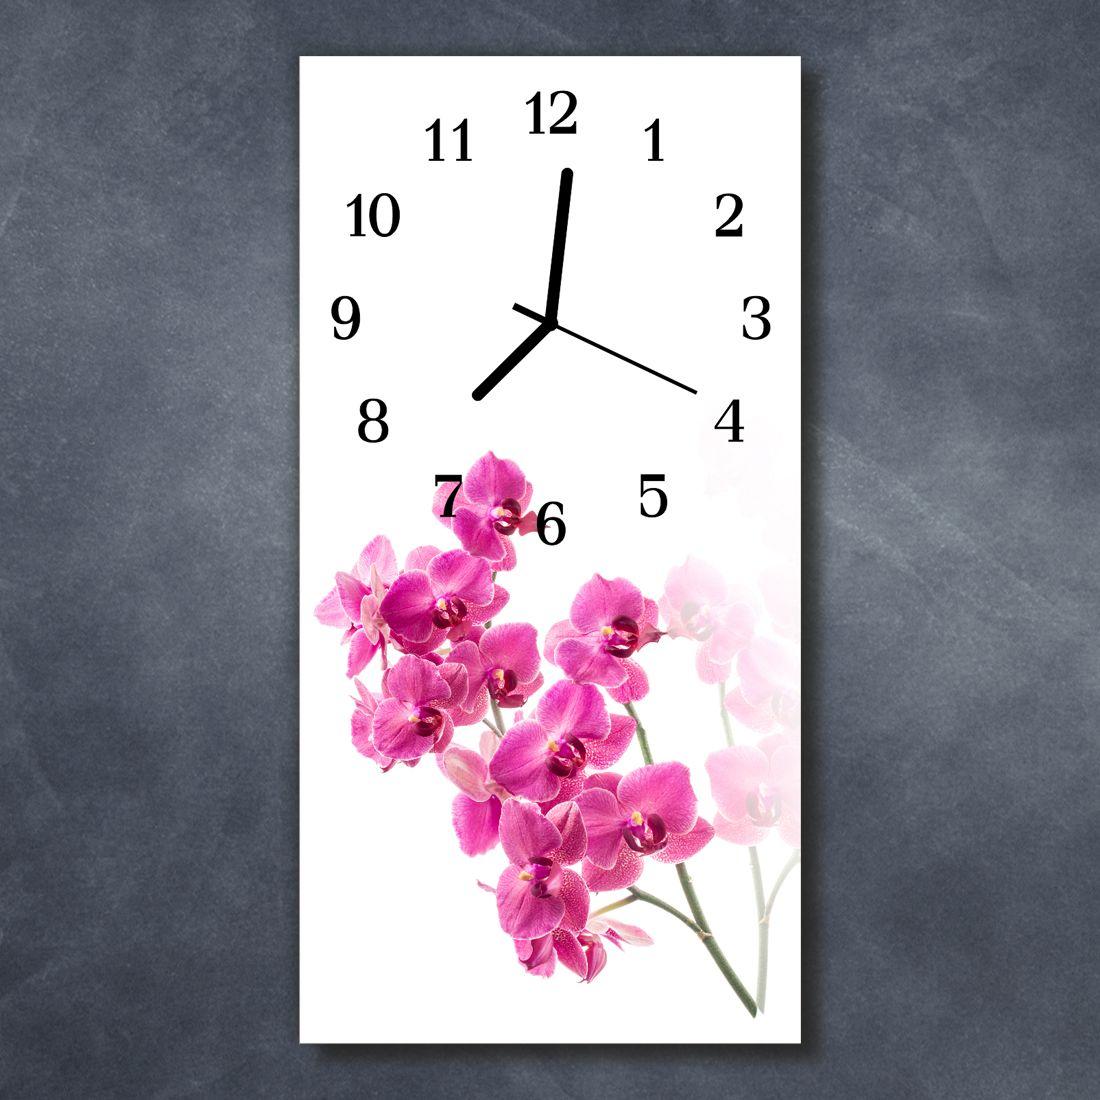 #wallclock #glass #glassclock #walldecor #forspring #springdecor #interiors #interioires #pink #pinkfloral #floralpattern #florallovers #homedecorlovers